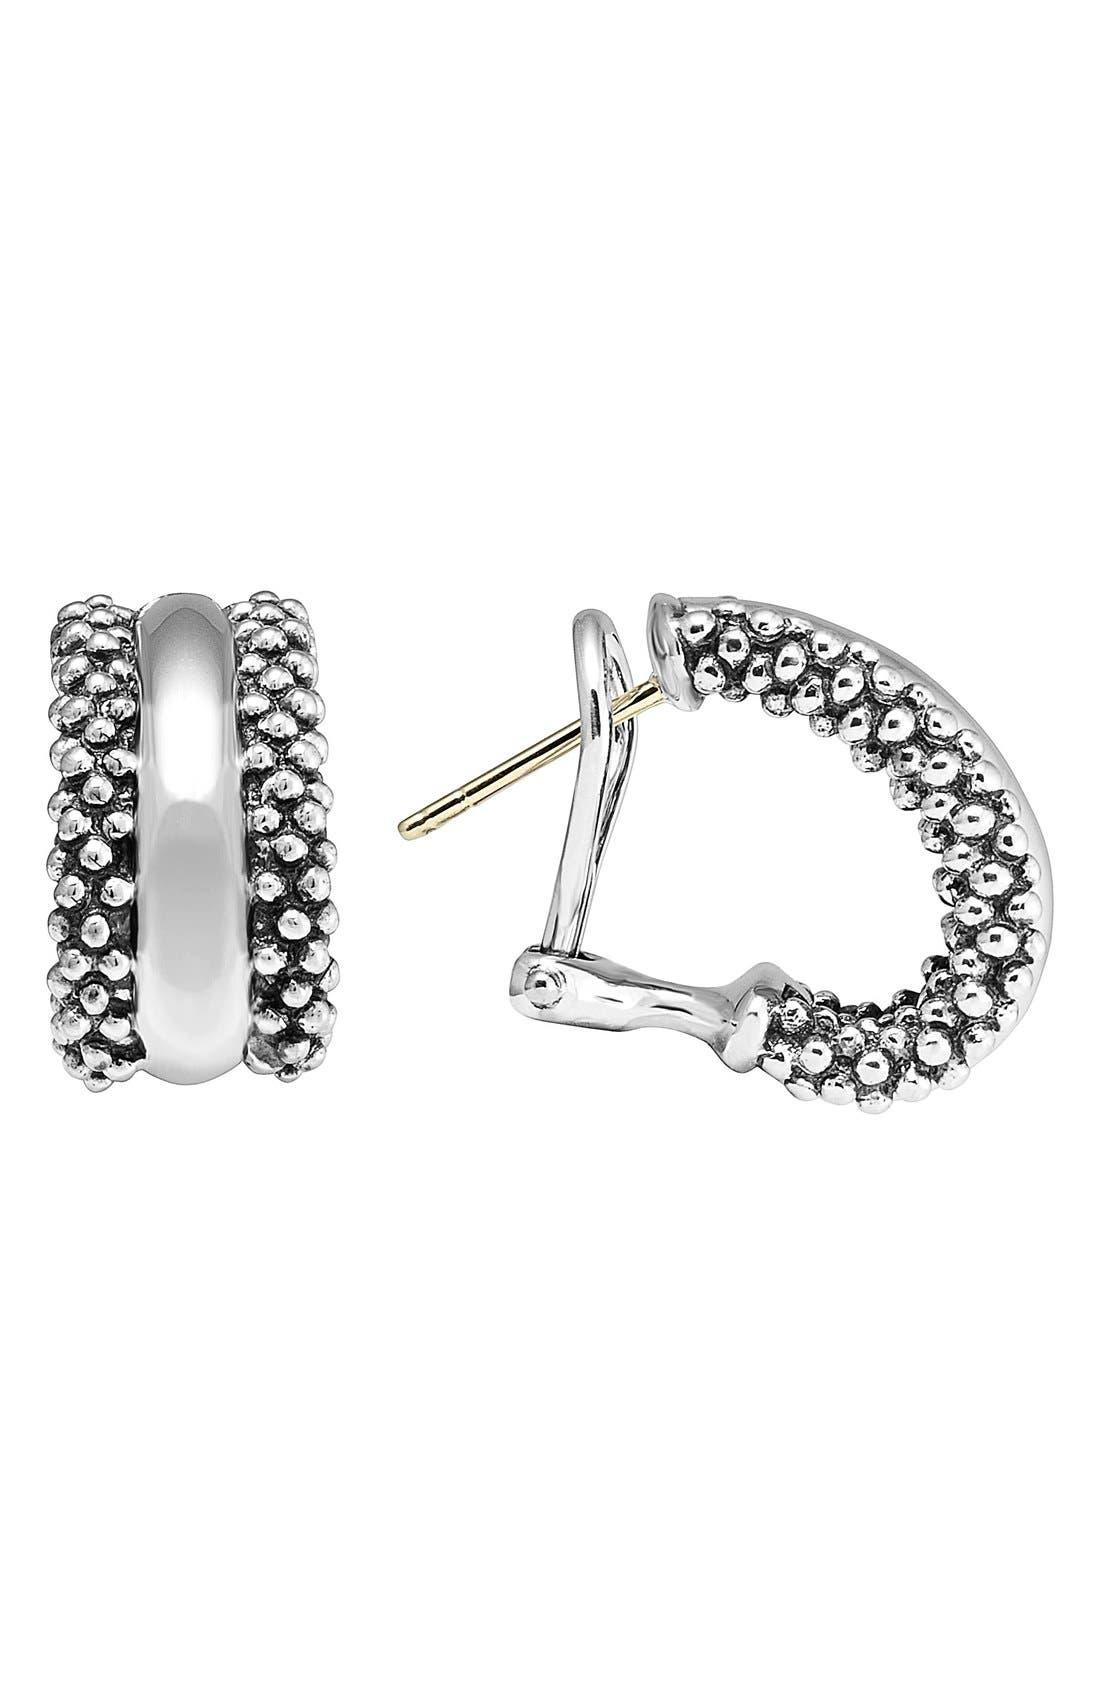 Caviar<sup>™</sup> Sterling Silver Hoop Earrings,                         Main,                         color, STERLING SILVER